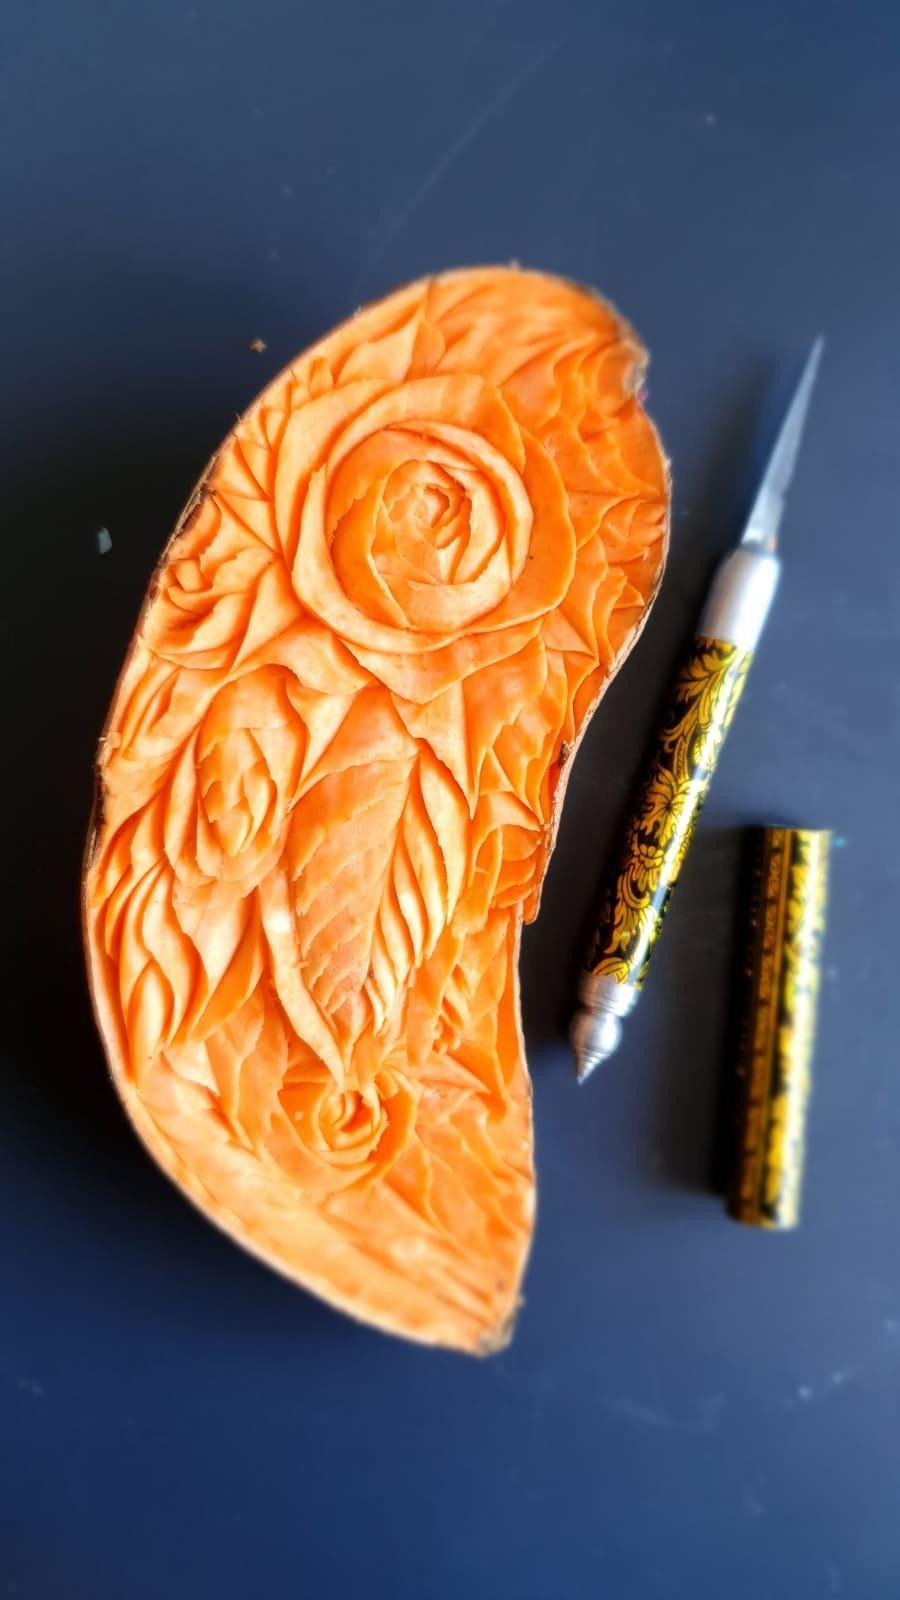 Sweet Potato sculpture